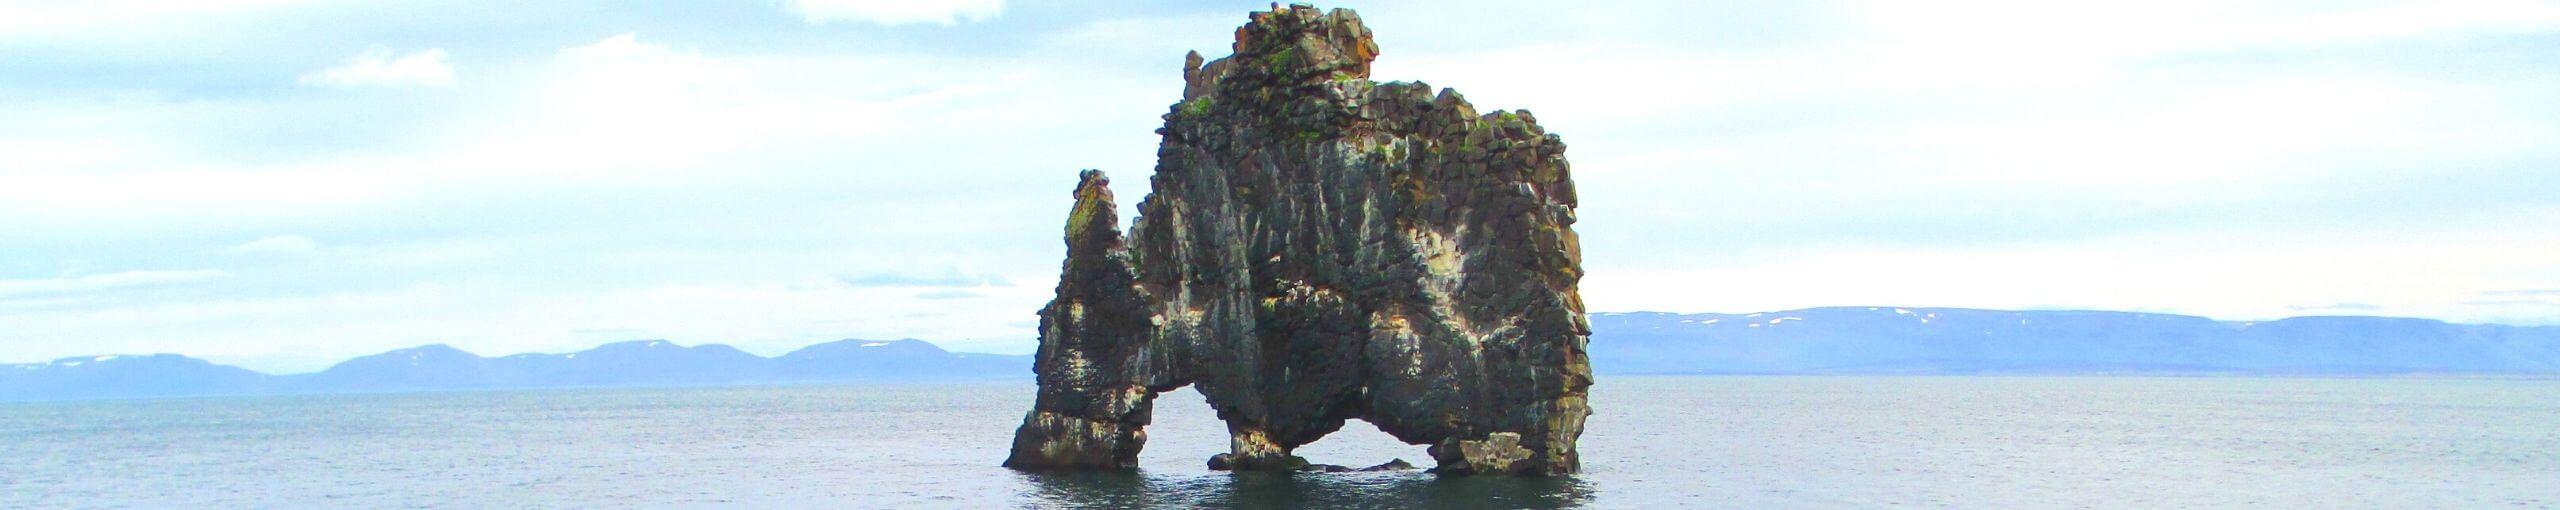 Península de Vatnsnes. Hvammstangi. Norðurland Vestra. Islandia.